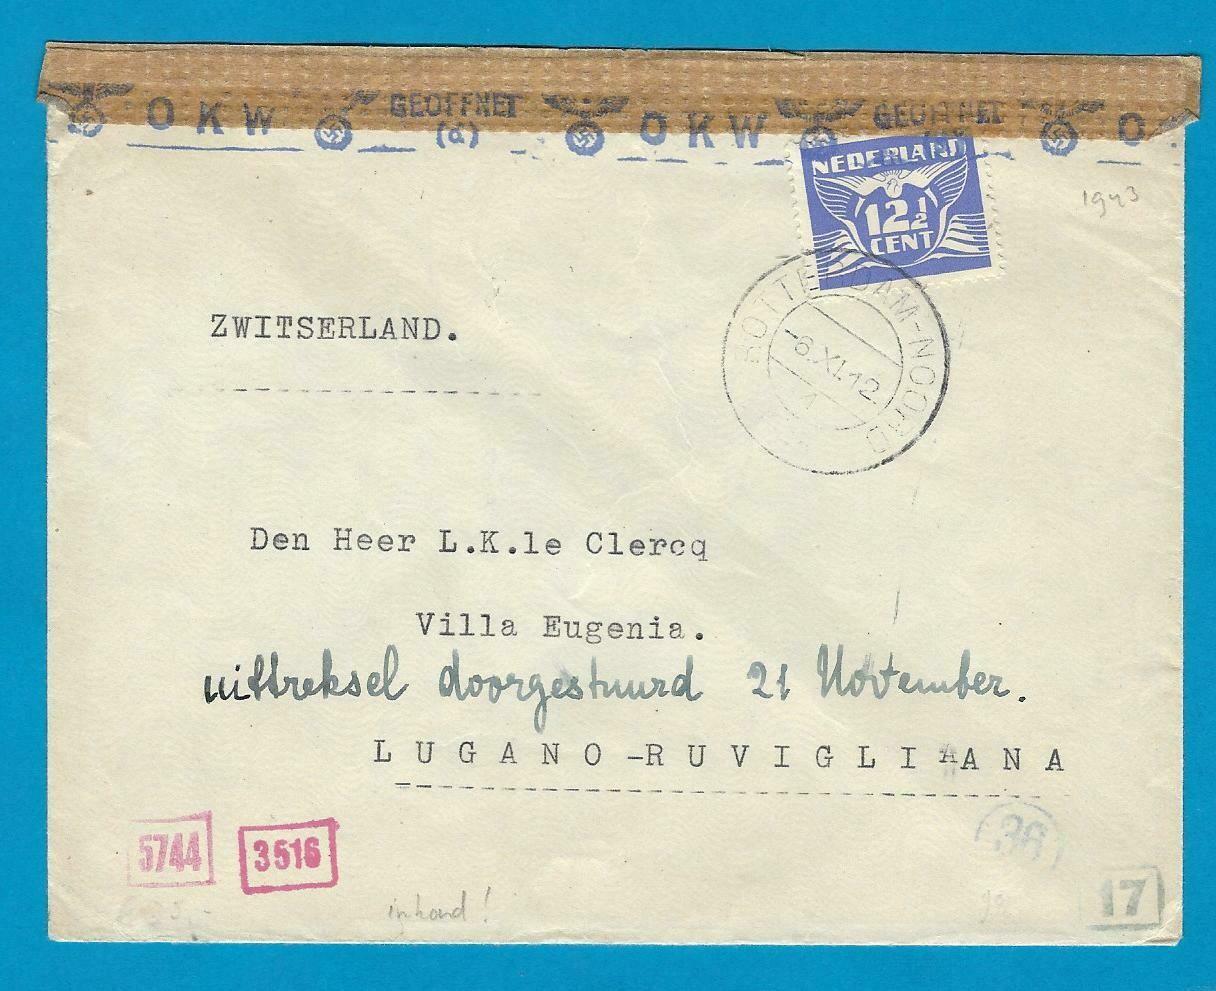 NEDERLAND censuur brief 1943 Rotterdam naar contact adres